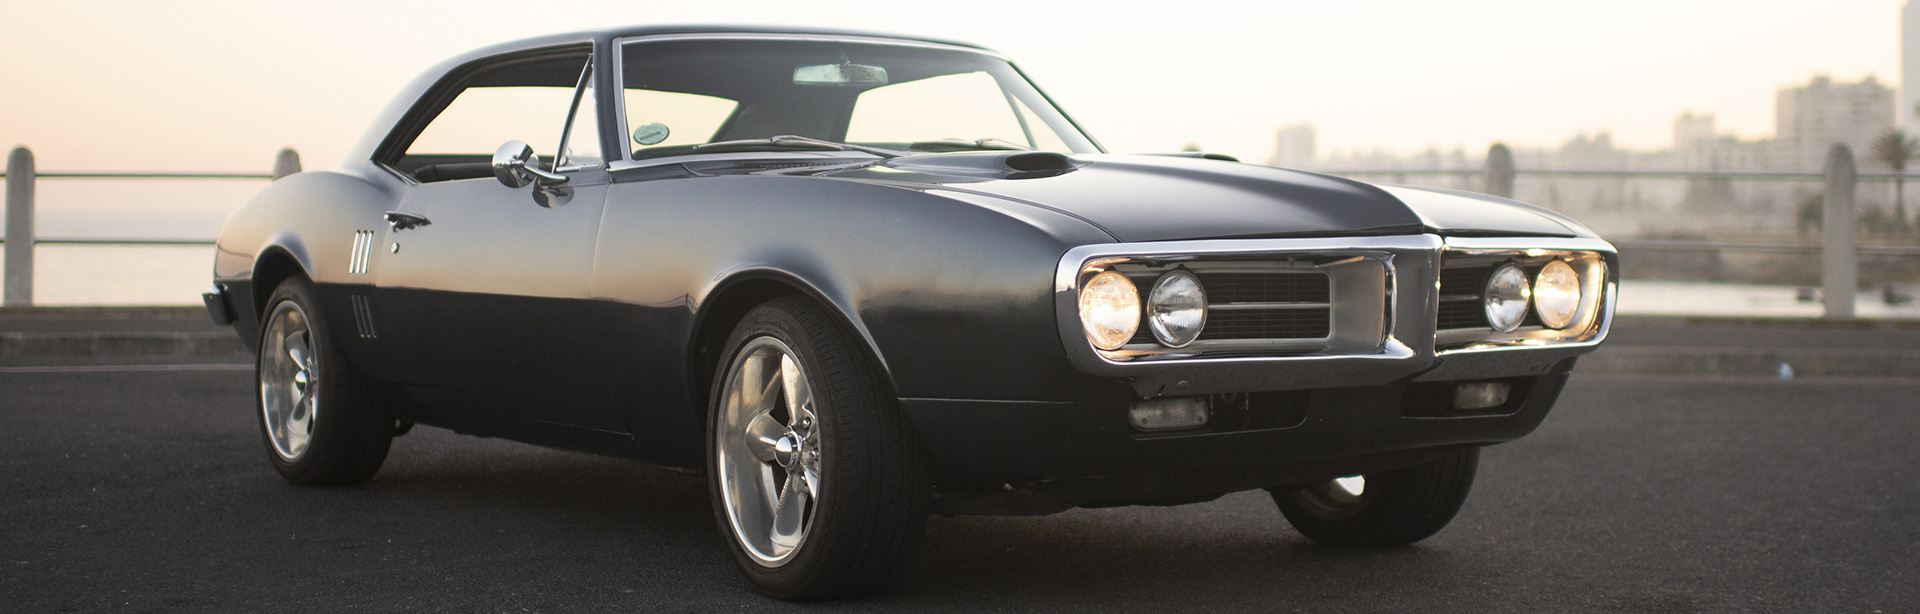 Muscle Cars For Sale in Auburn, MA